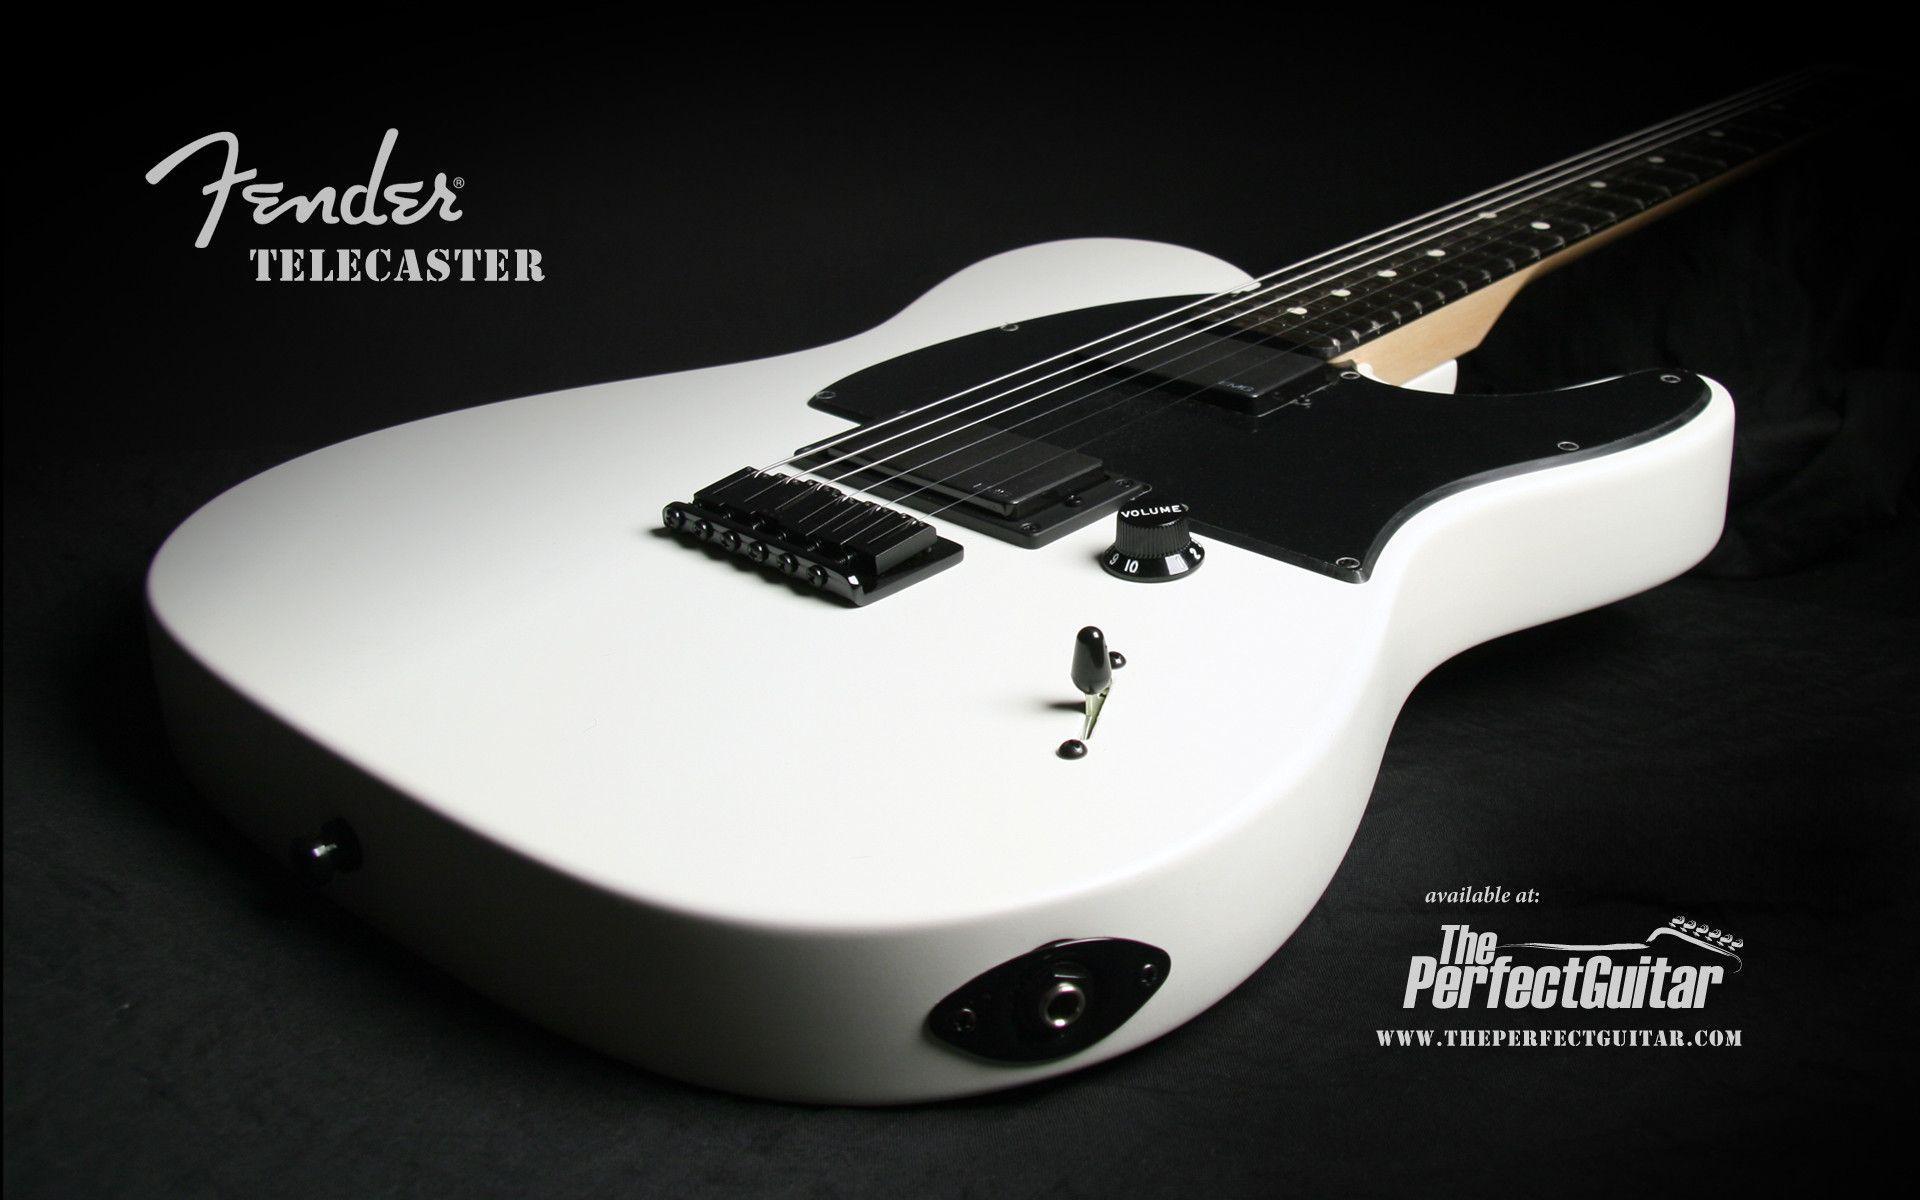 Fender Telecaster Wallpapers